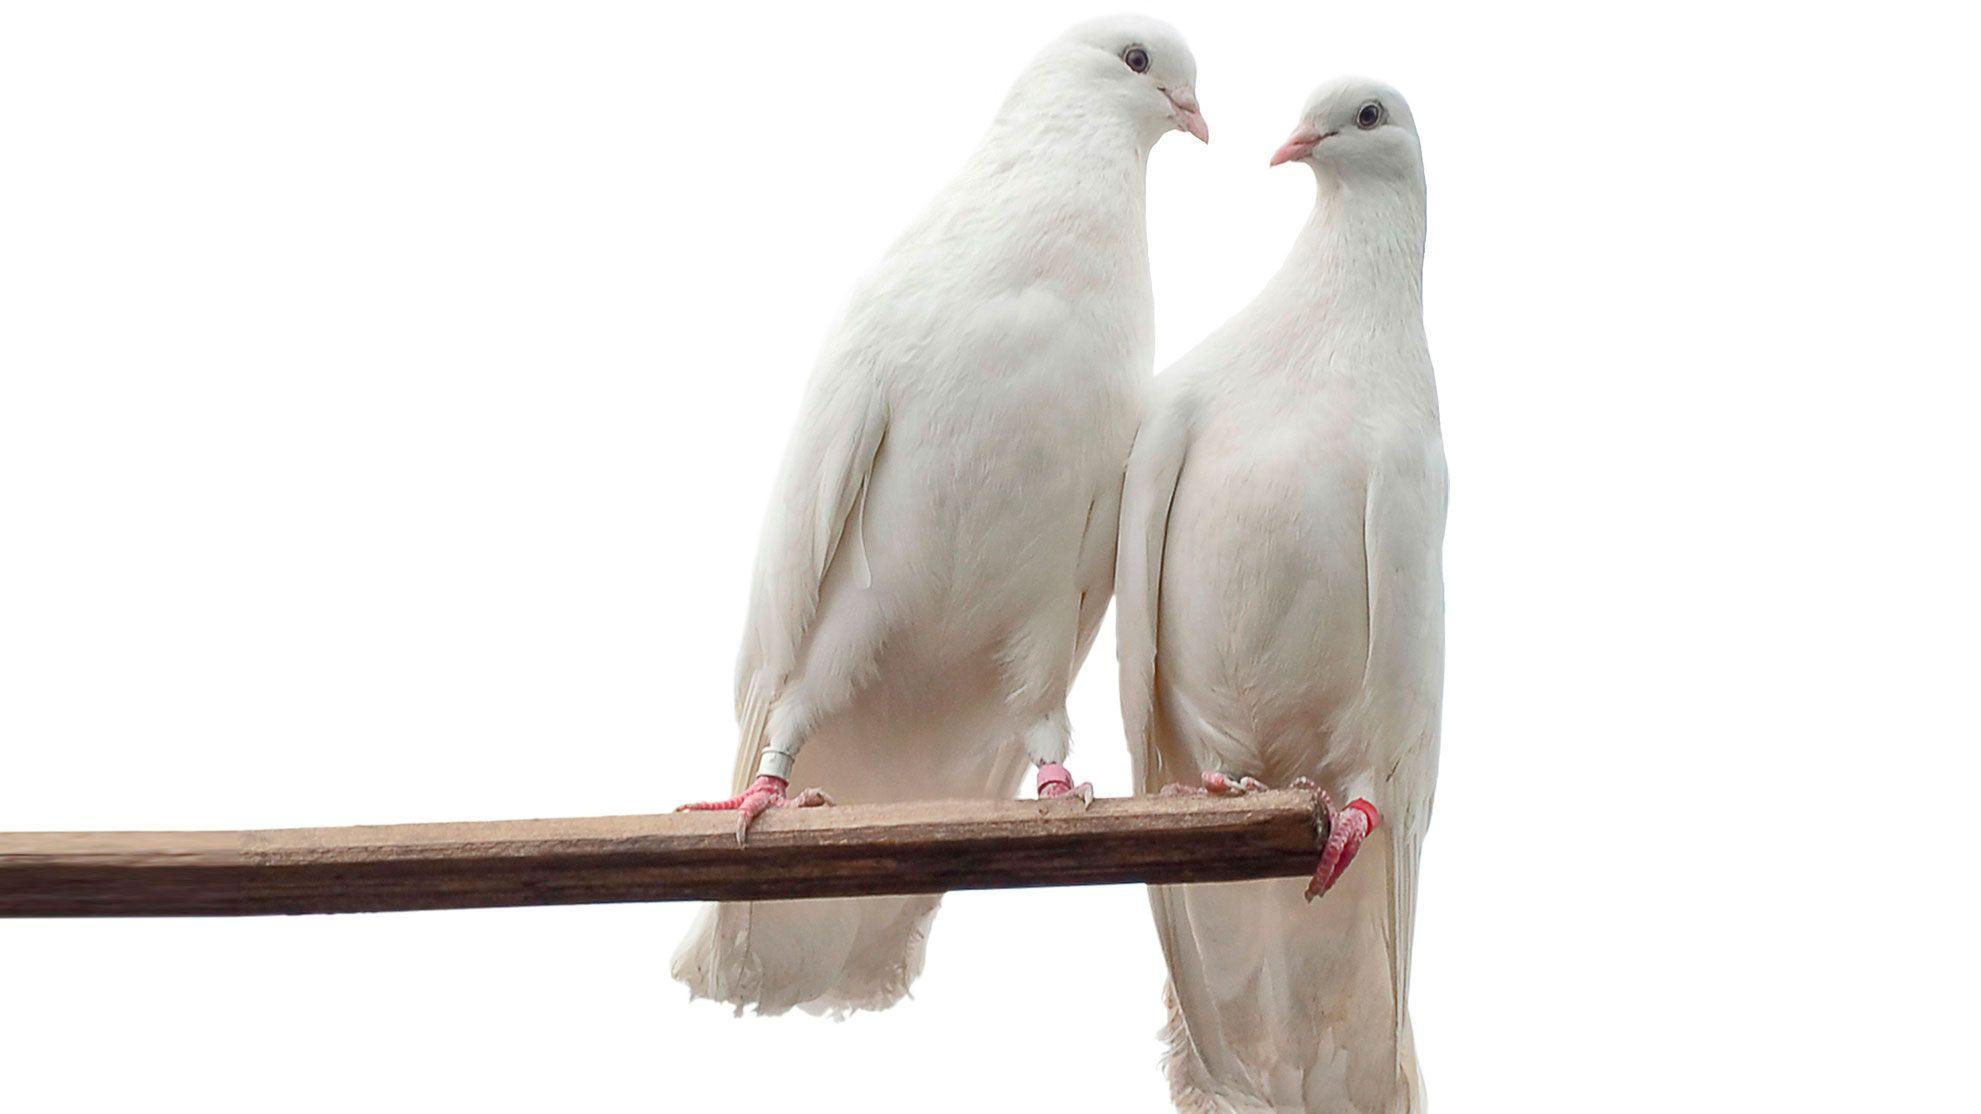 animales fieles - tórtolas